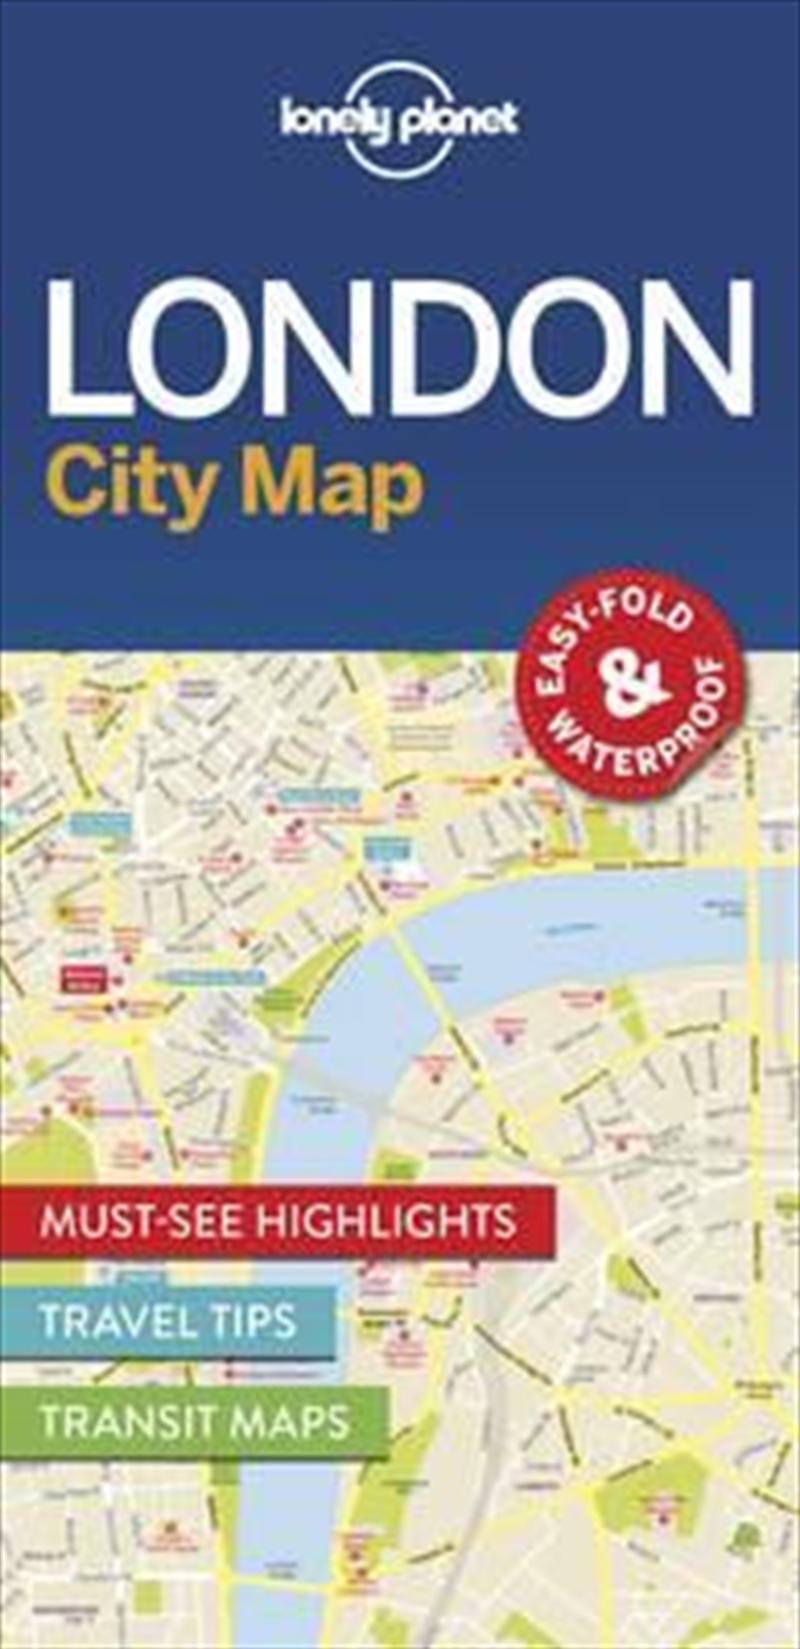 London City Map: Edition 1 | Sheet Map